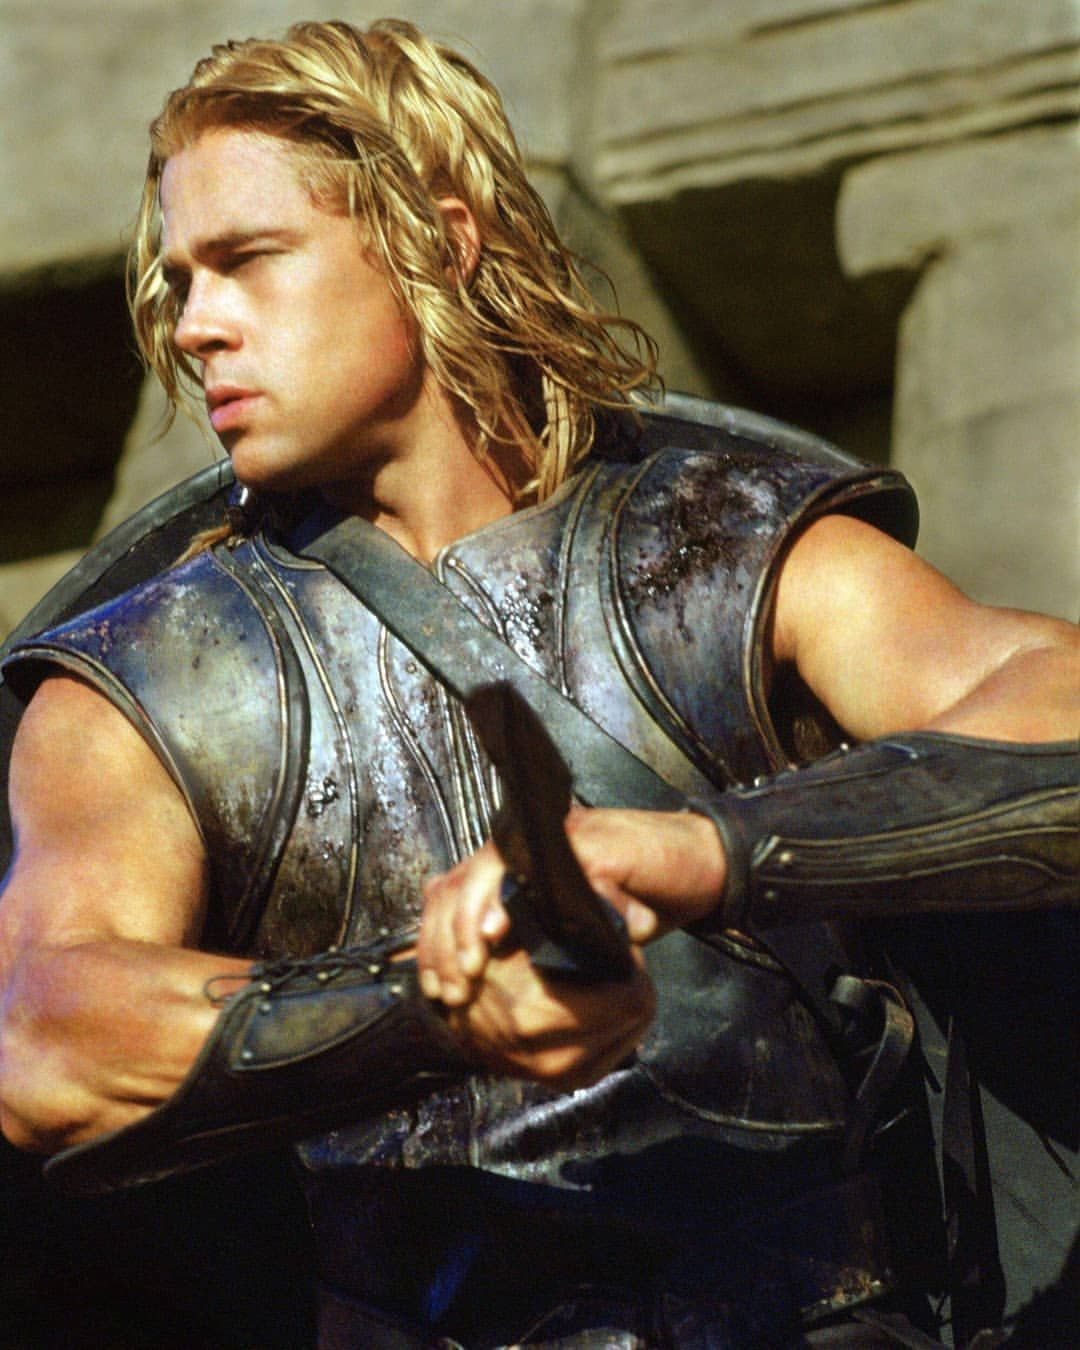 Brad Pitt Sur Instagram Tbt Troy 2004 Bradpitt Troy